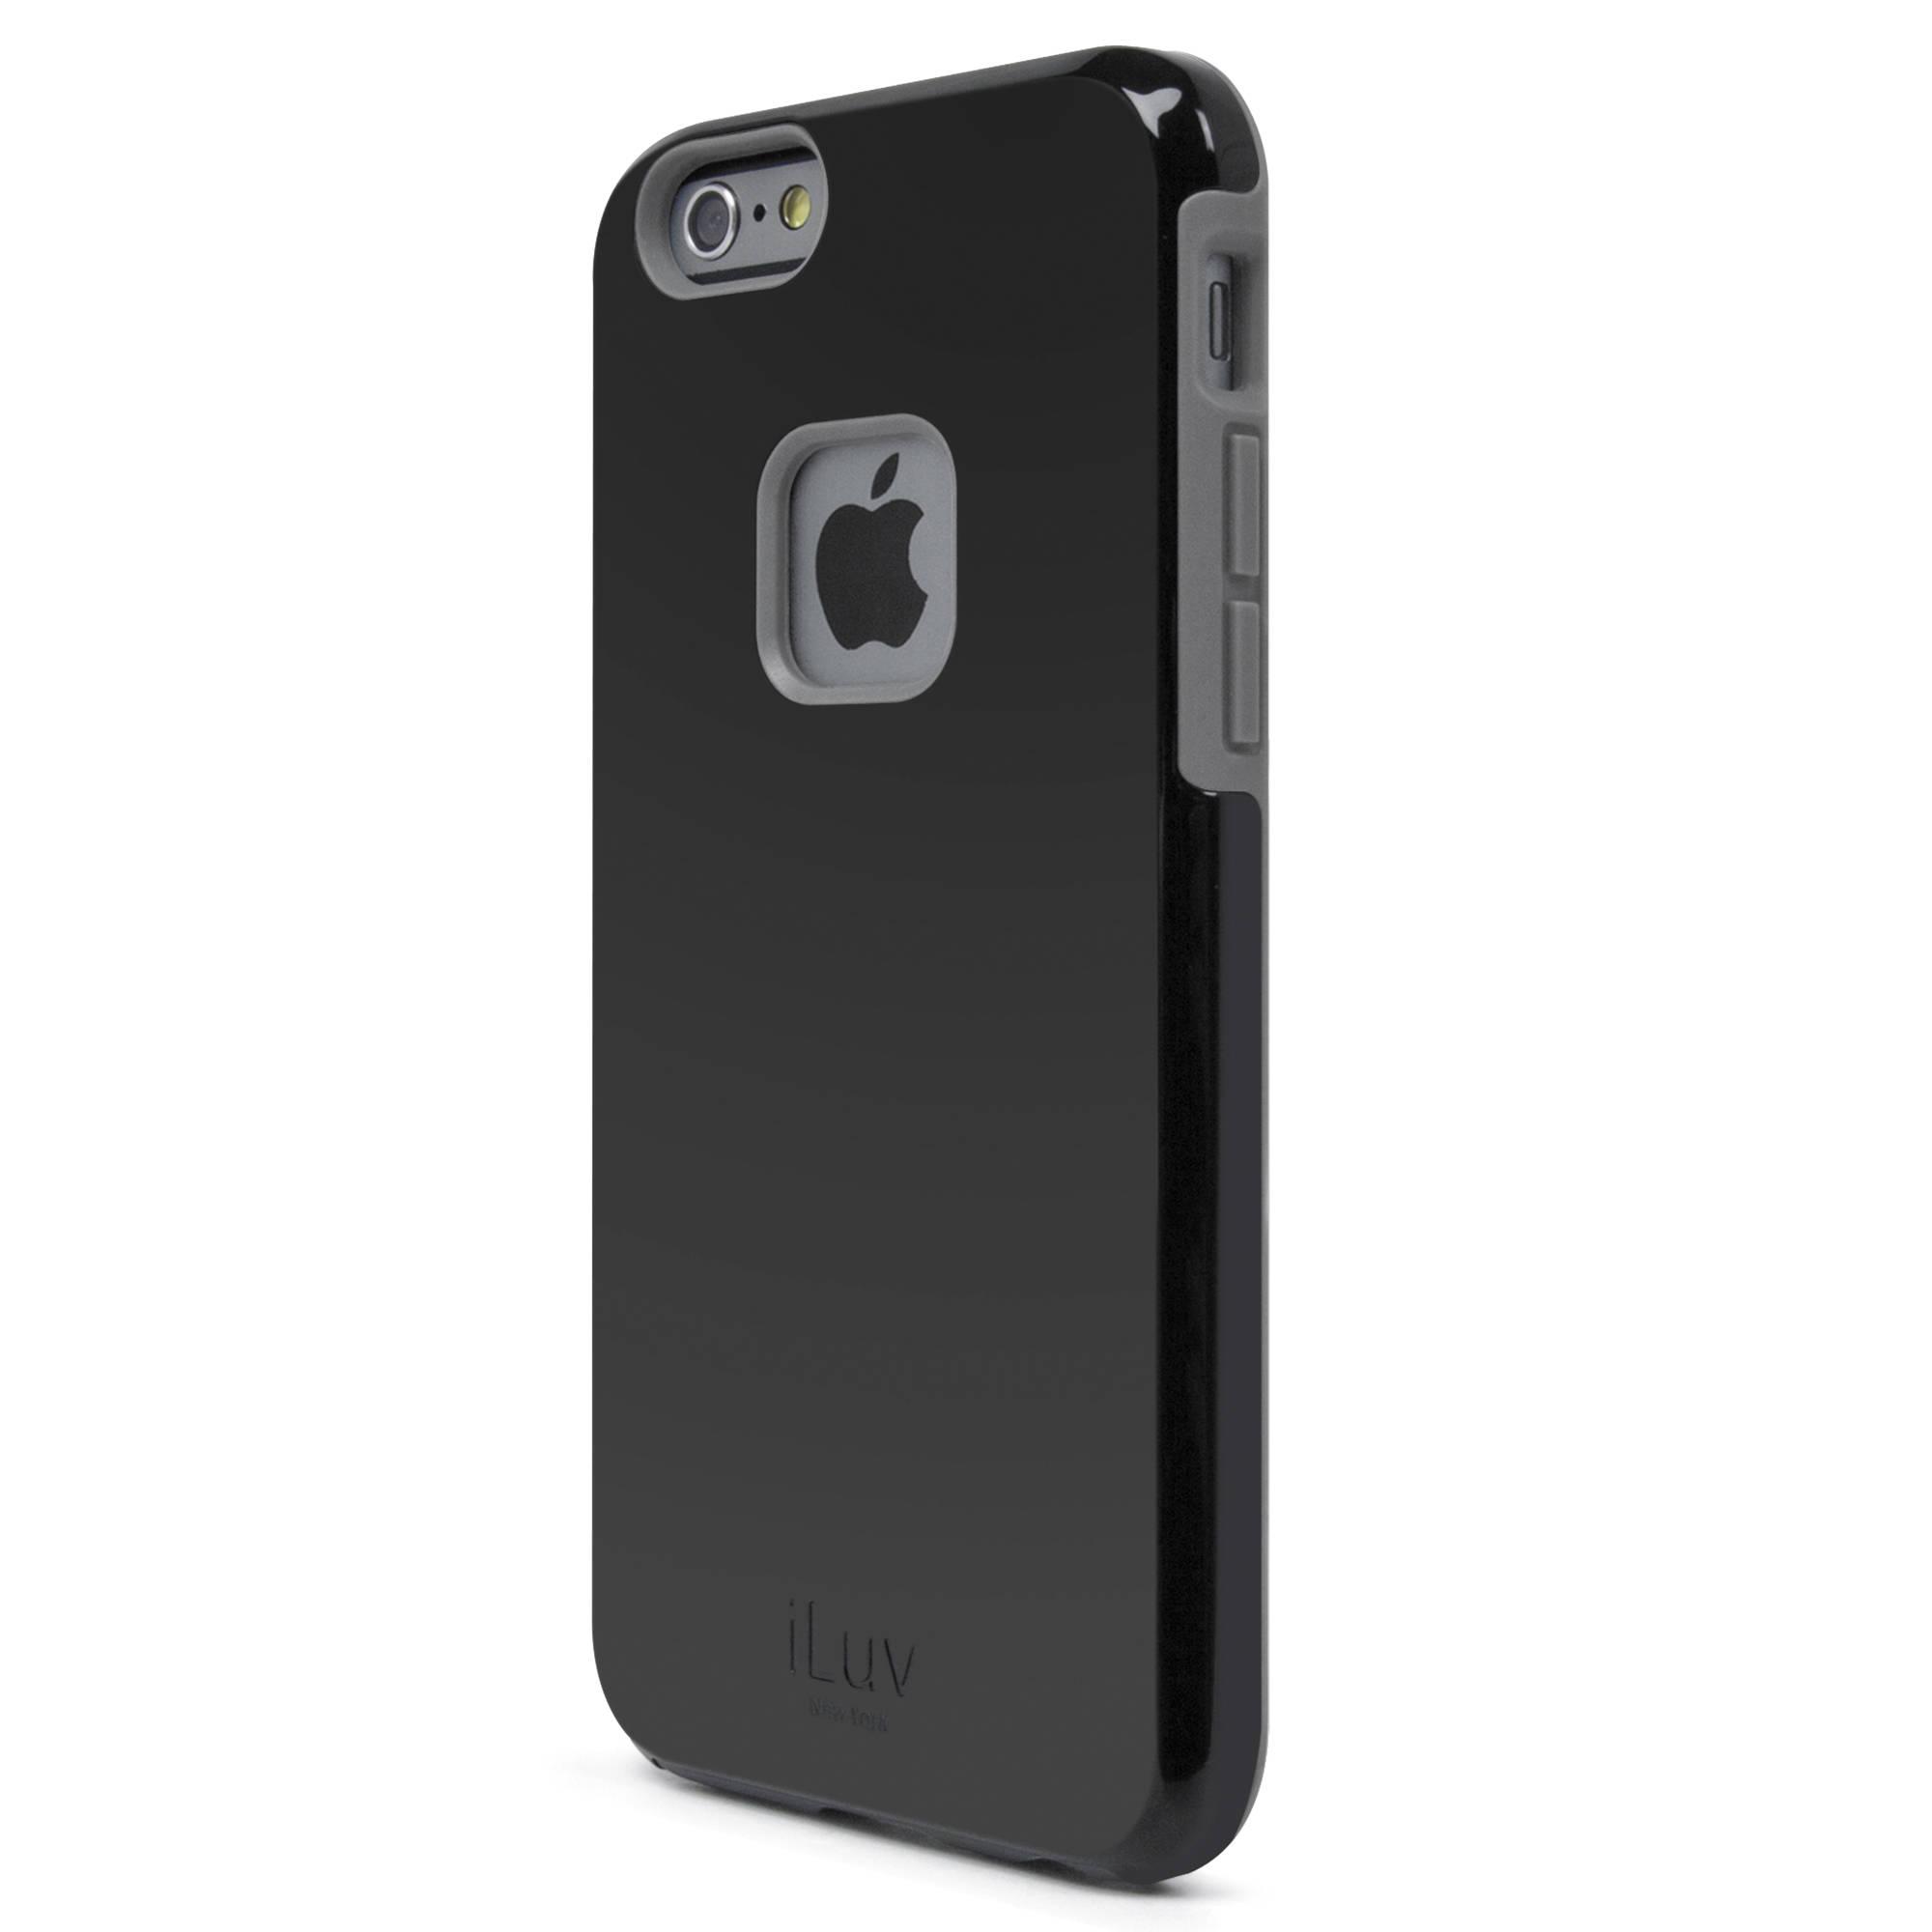 iluv regatta case for iphone 6 6s black ai6regabk b h photo. Black Bedroom Furniture Sets. Home Design Ideas